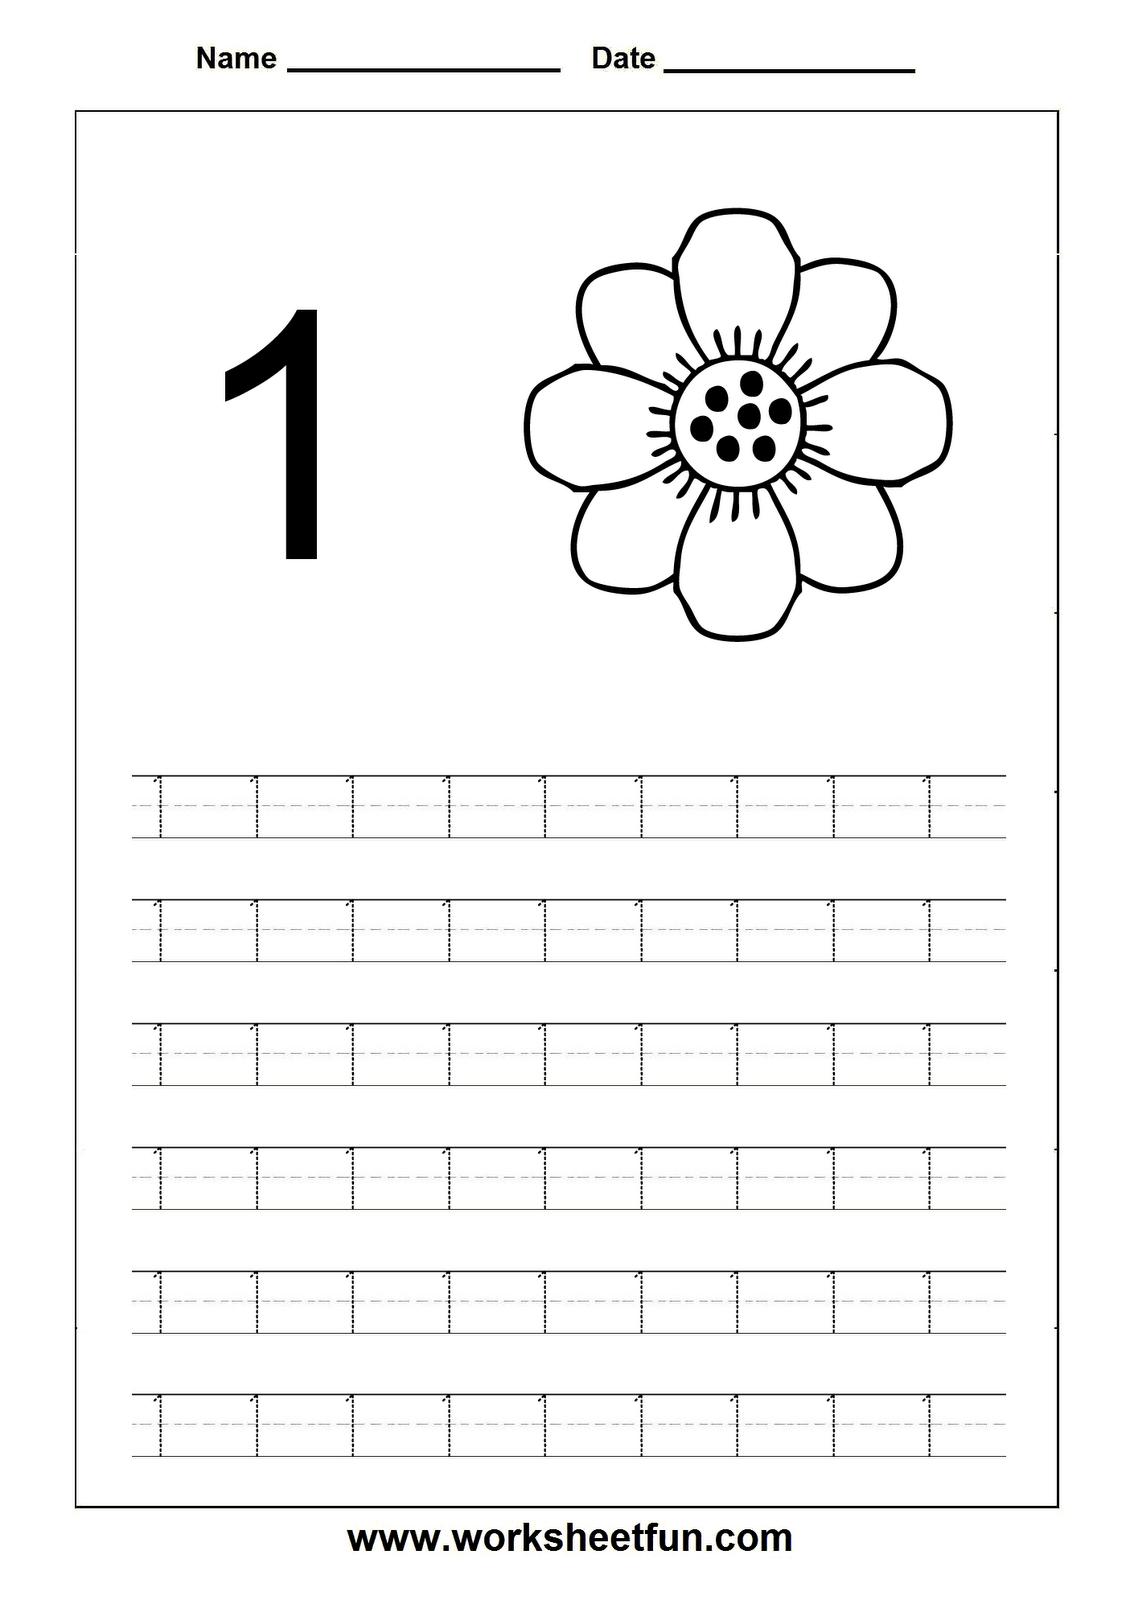 Collection Of Number 1 Worksheets For Pre K